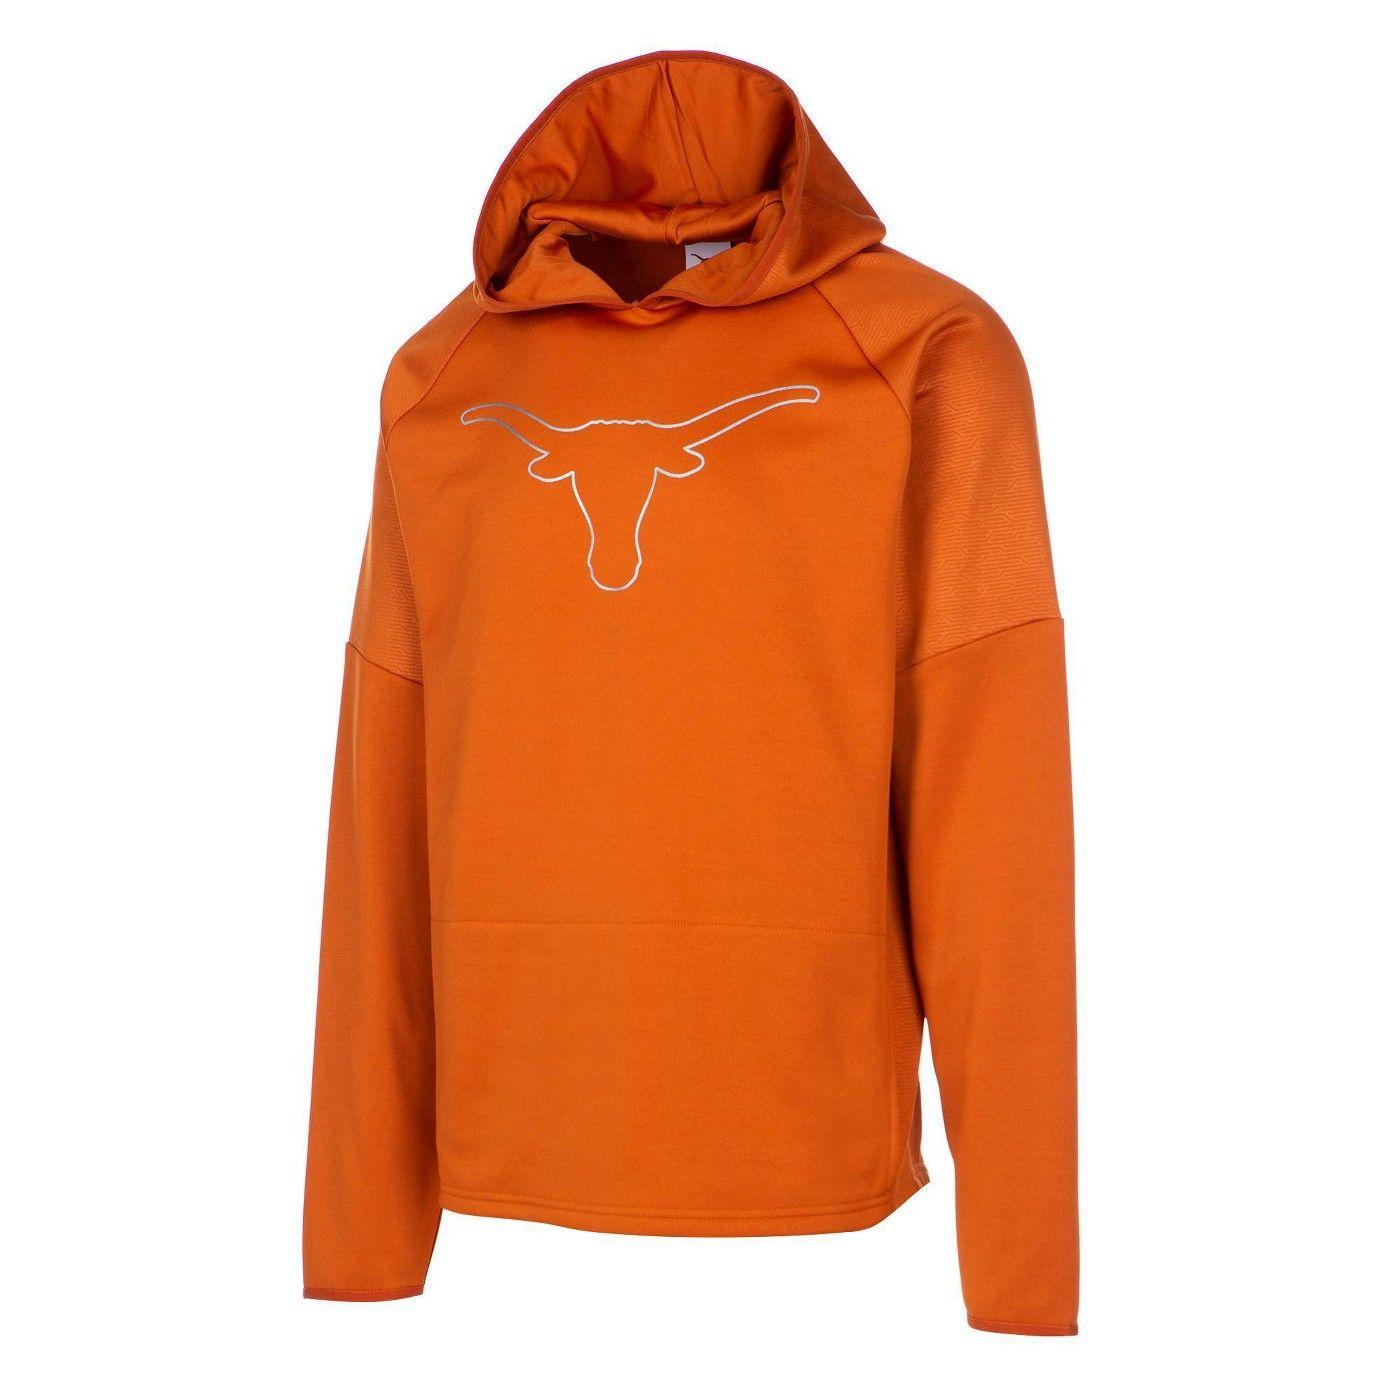 Ncaa Texas Longhorns Men S Long Sleeve Fleece Hoodie In 2020 Fleece Hoodie Hoodie Xxl Hoodies [ 1400 x 1400 Pixel ]